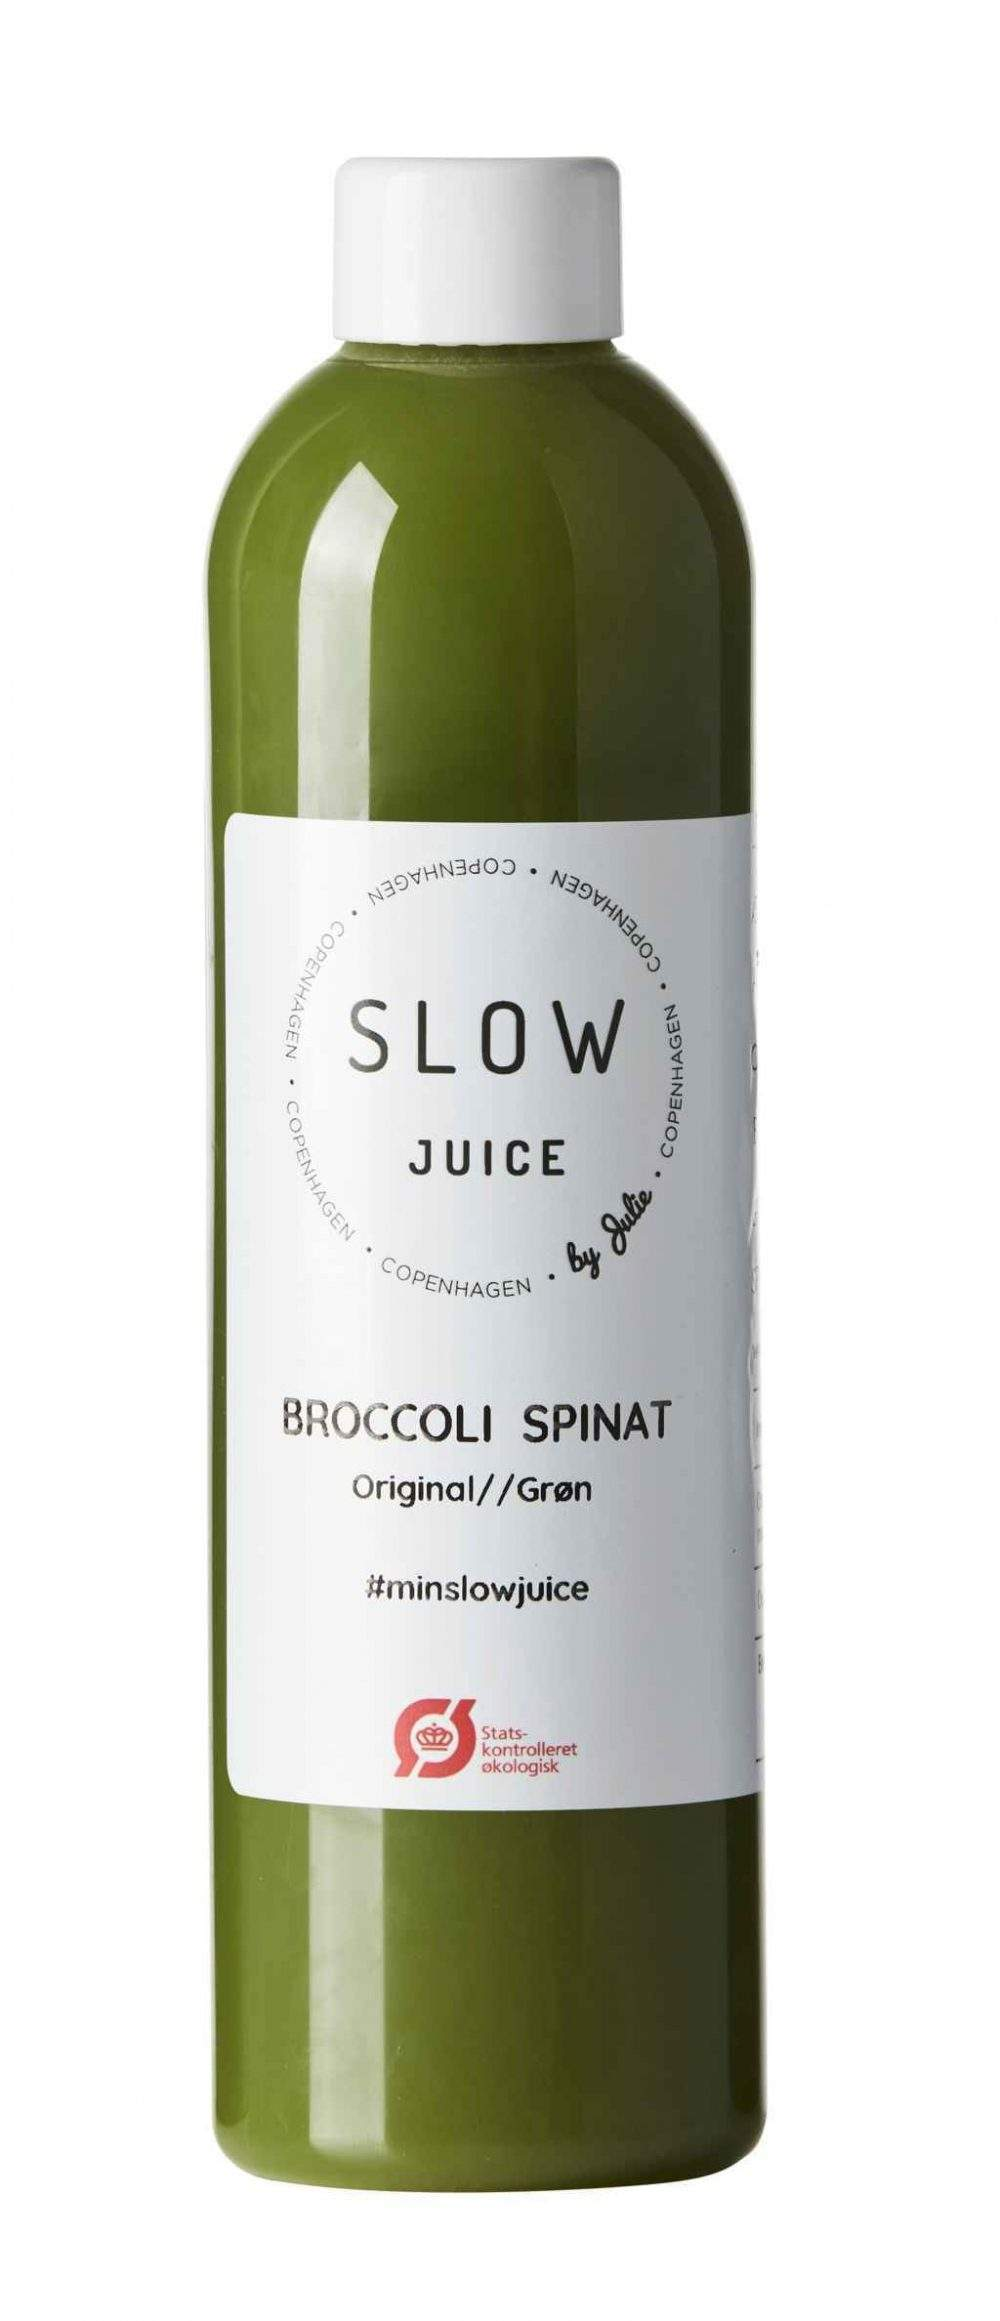 broccoli spinat Slowjuice paa hvid baggrund